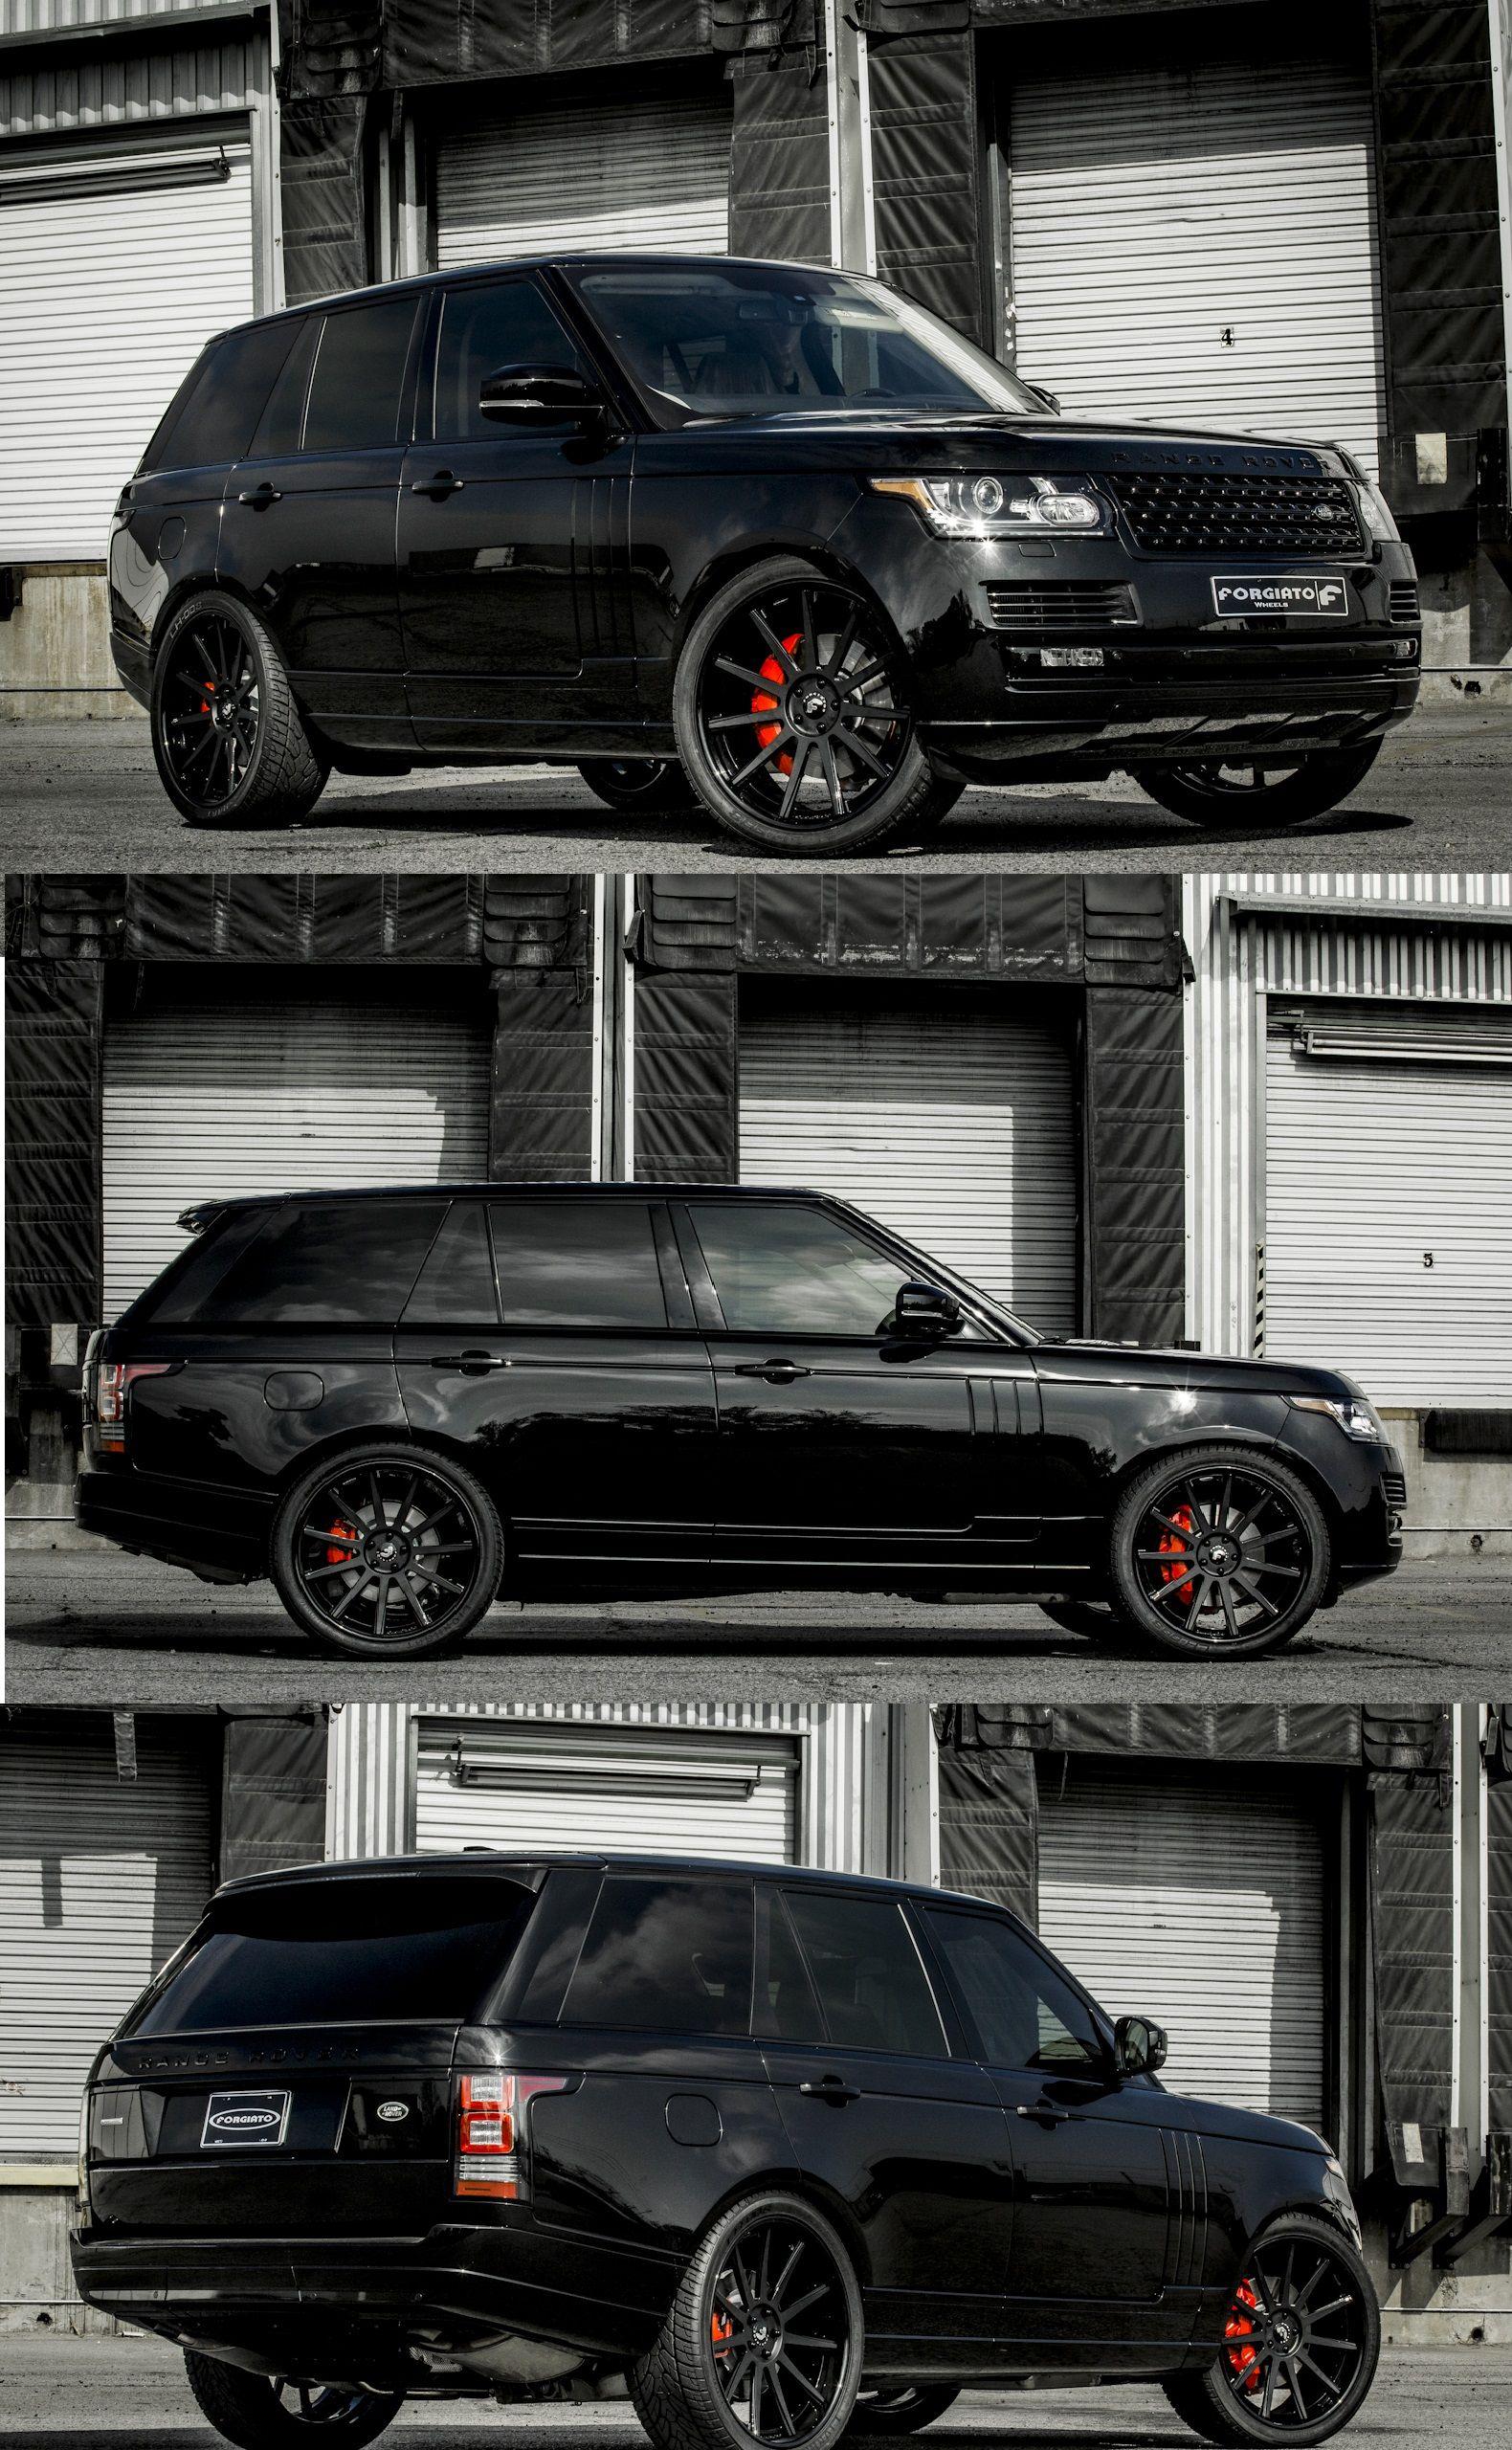 Range Rover Black Edition Range Rover Black Luxury Cars Range